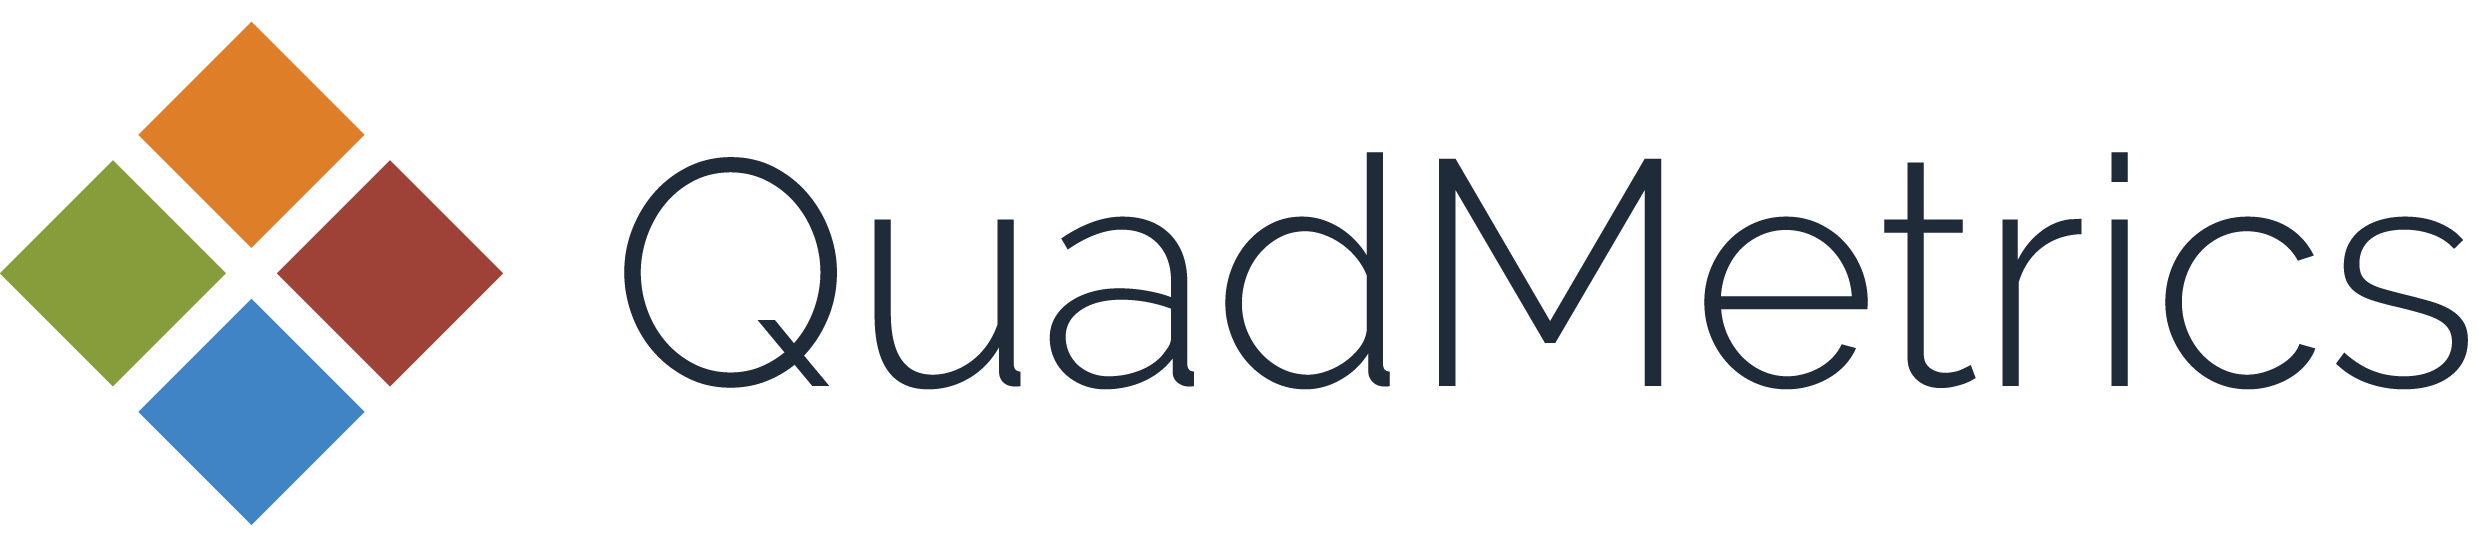 QuadMetrics logo